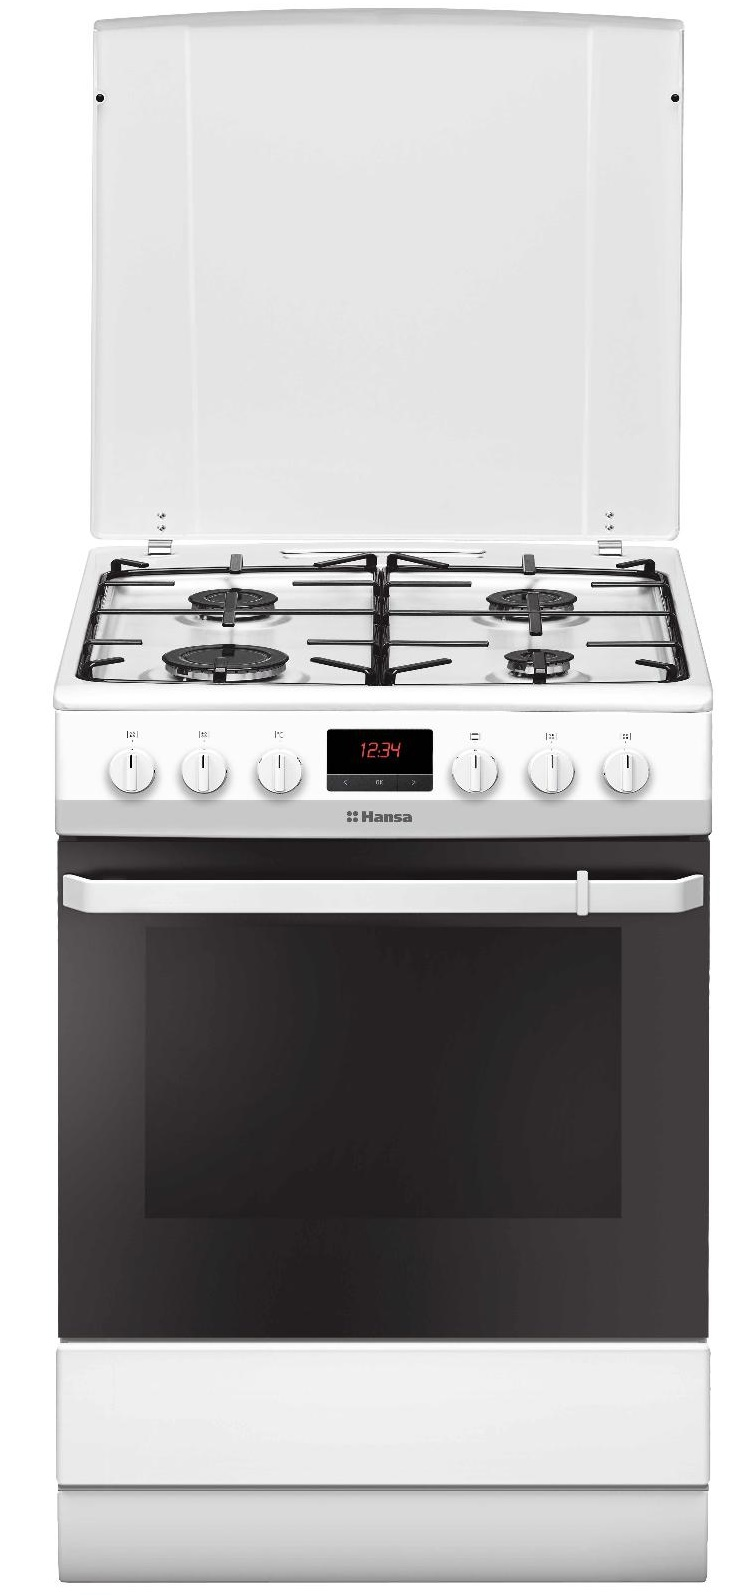 Aragaz mixt Hansa FCMW68299, plita gaz, cuptor electric, 4 arzatoare, alb